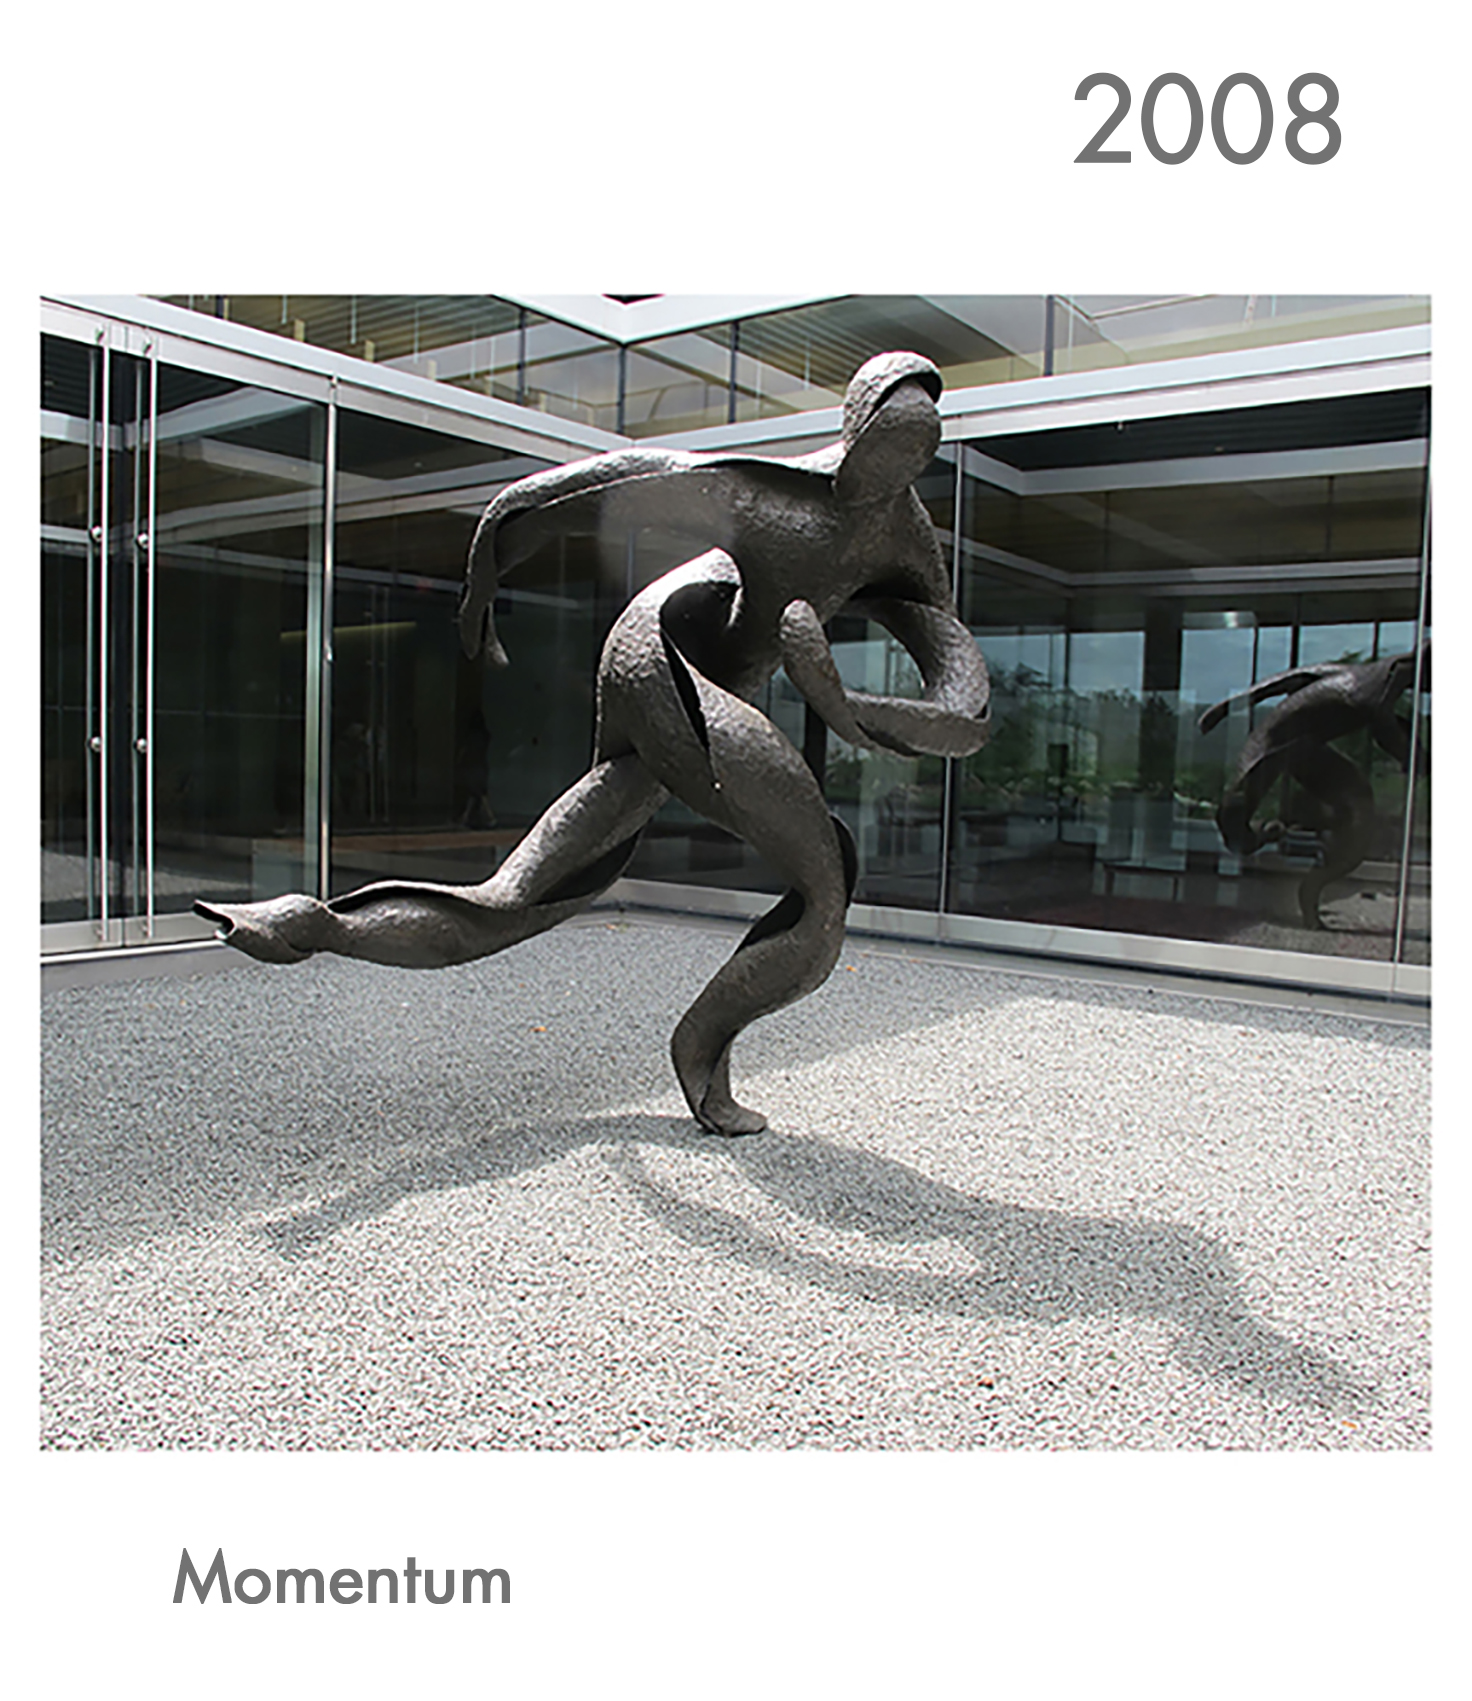 2008 Momentum copy2.jpg